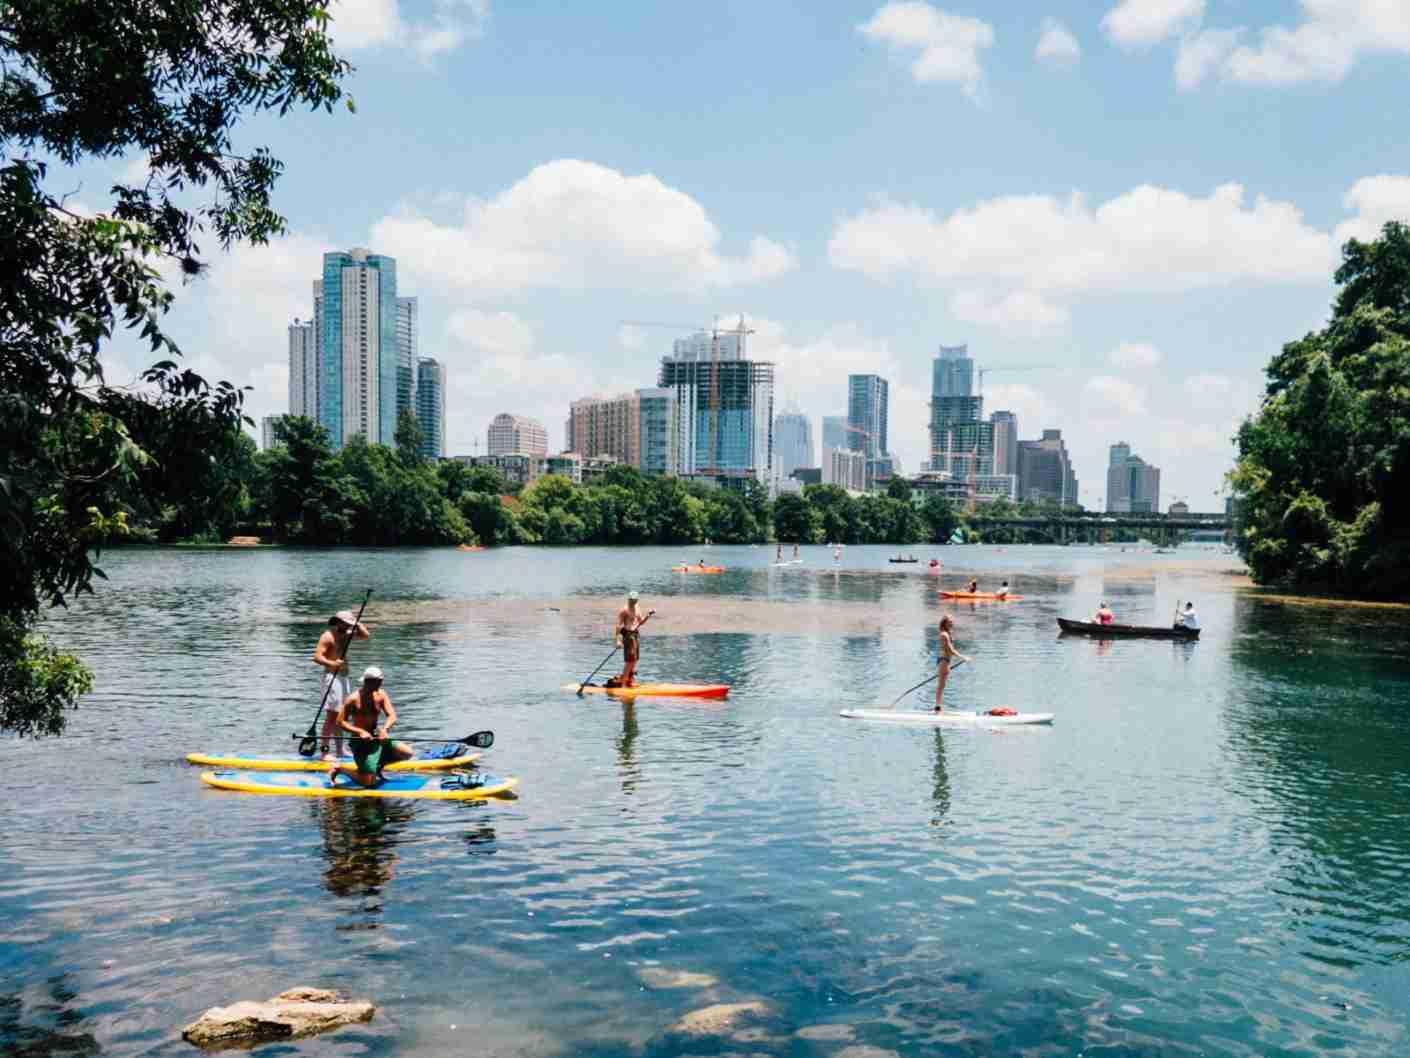 Paddle boarding at Lou Neff Point in Austin, TX. (Photo by Tomek Baginski/Unsplash)